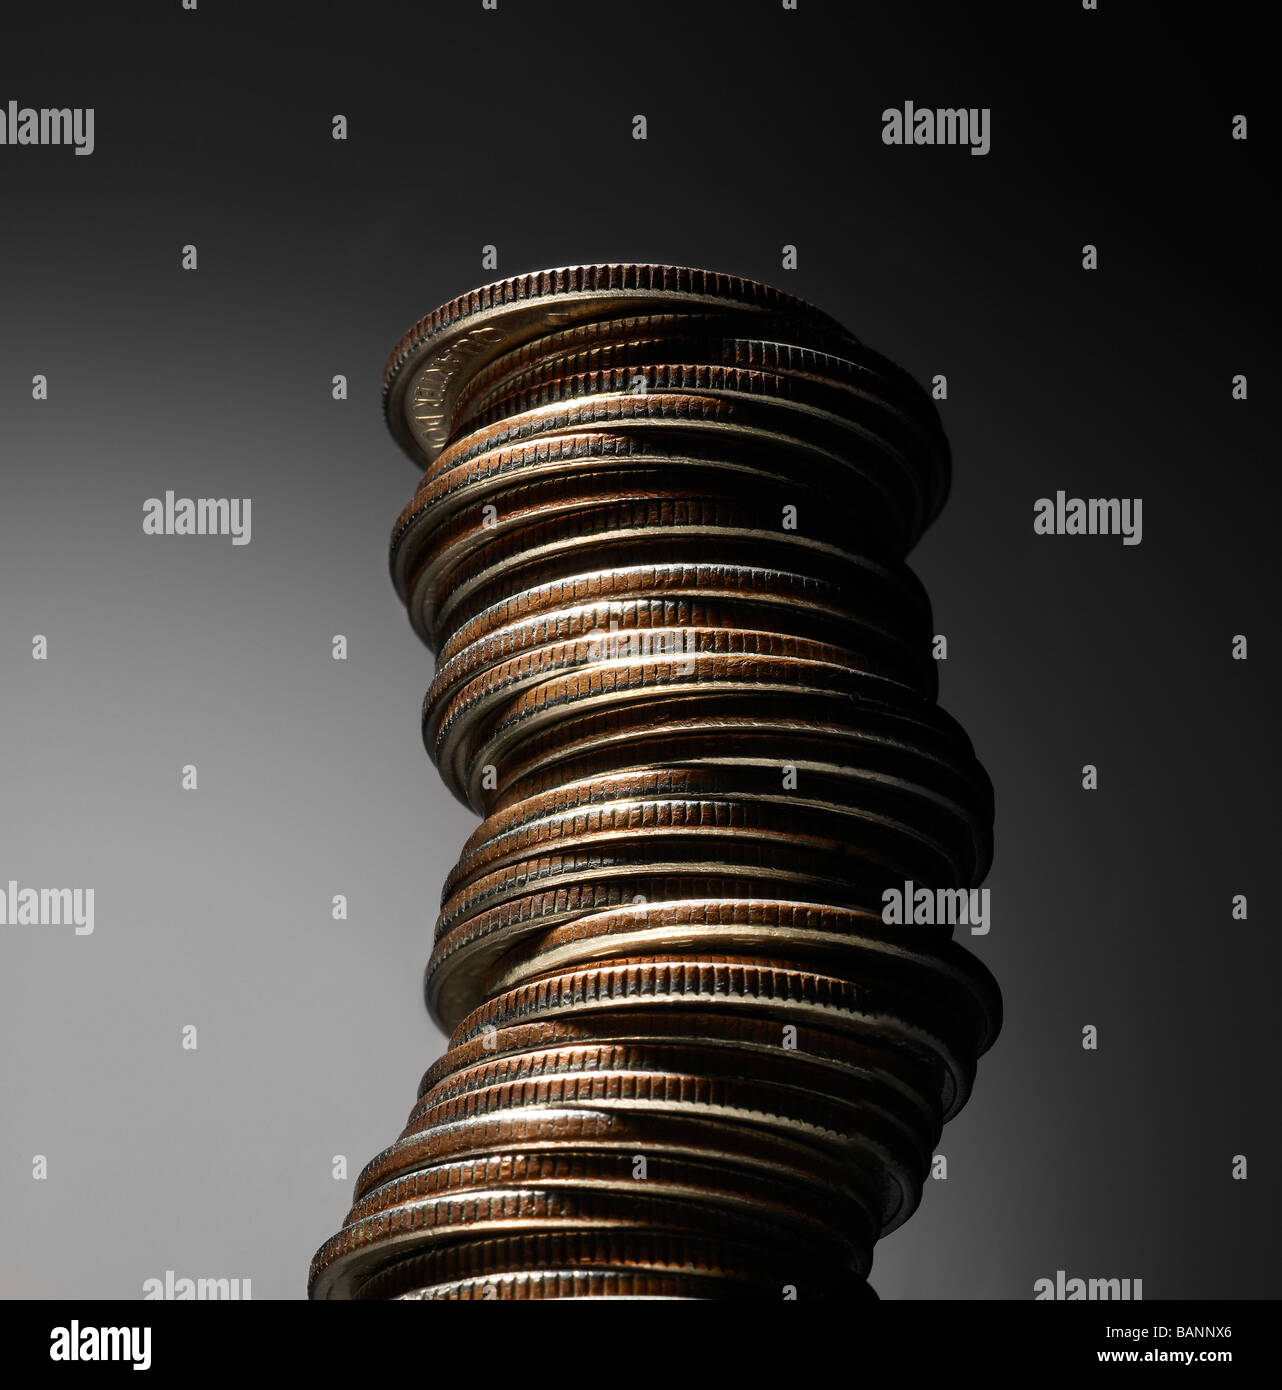 Side Angel Shot of Single Stack of Quarters - Stock Image